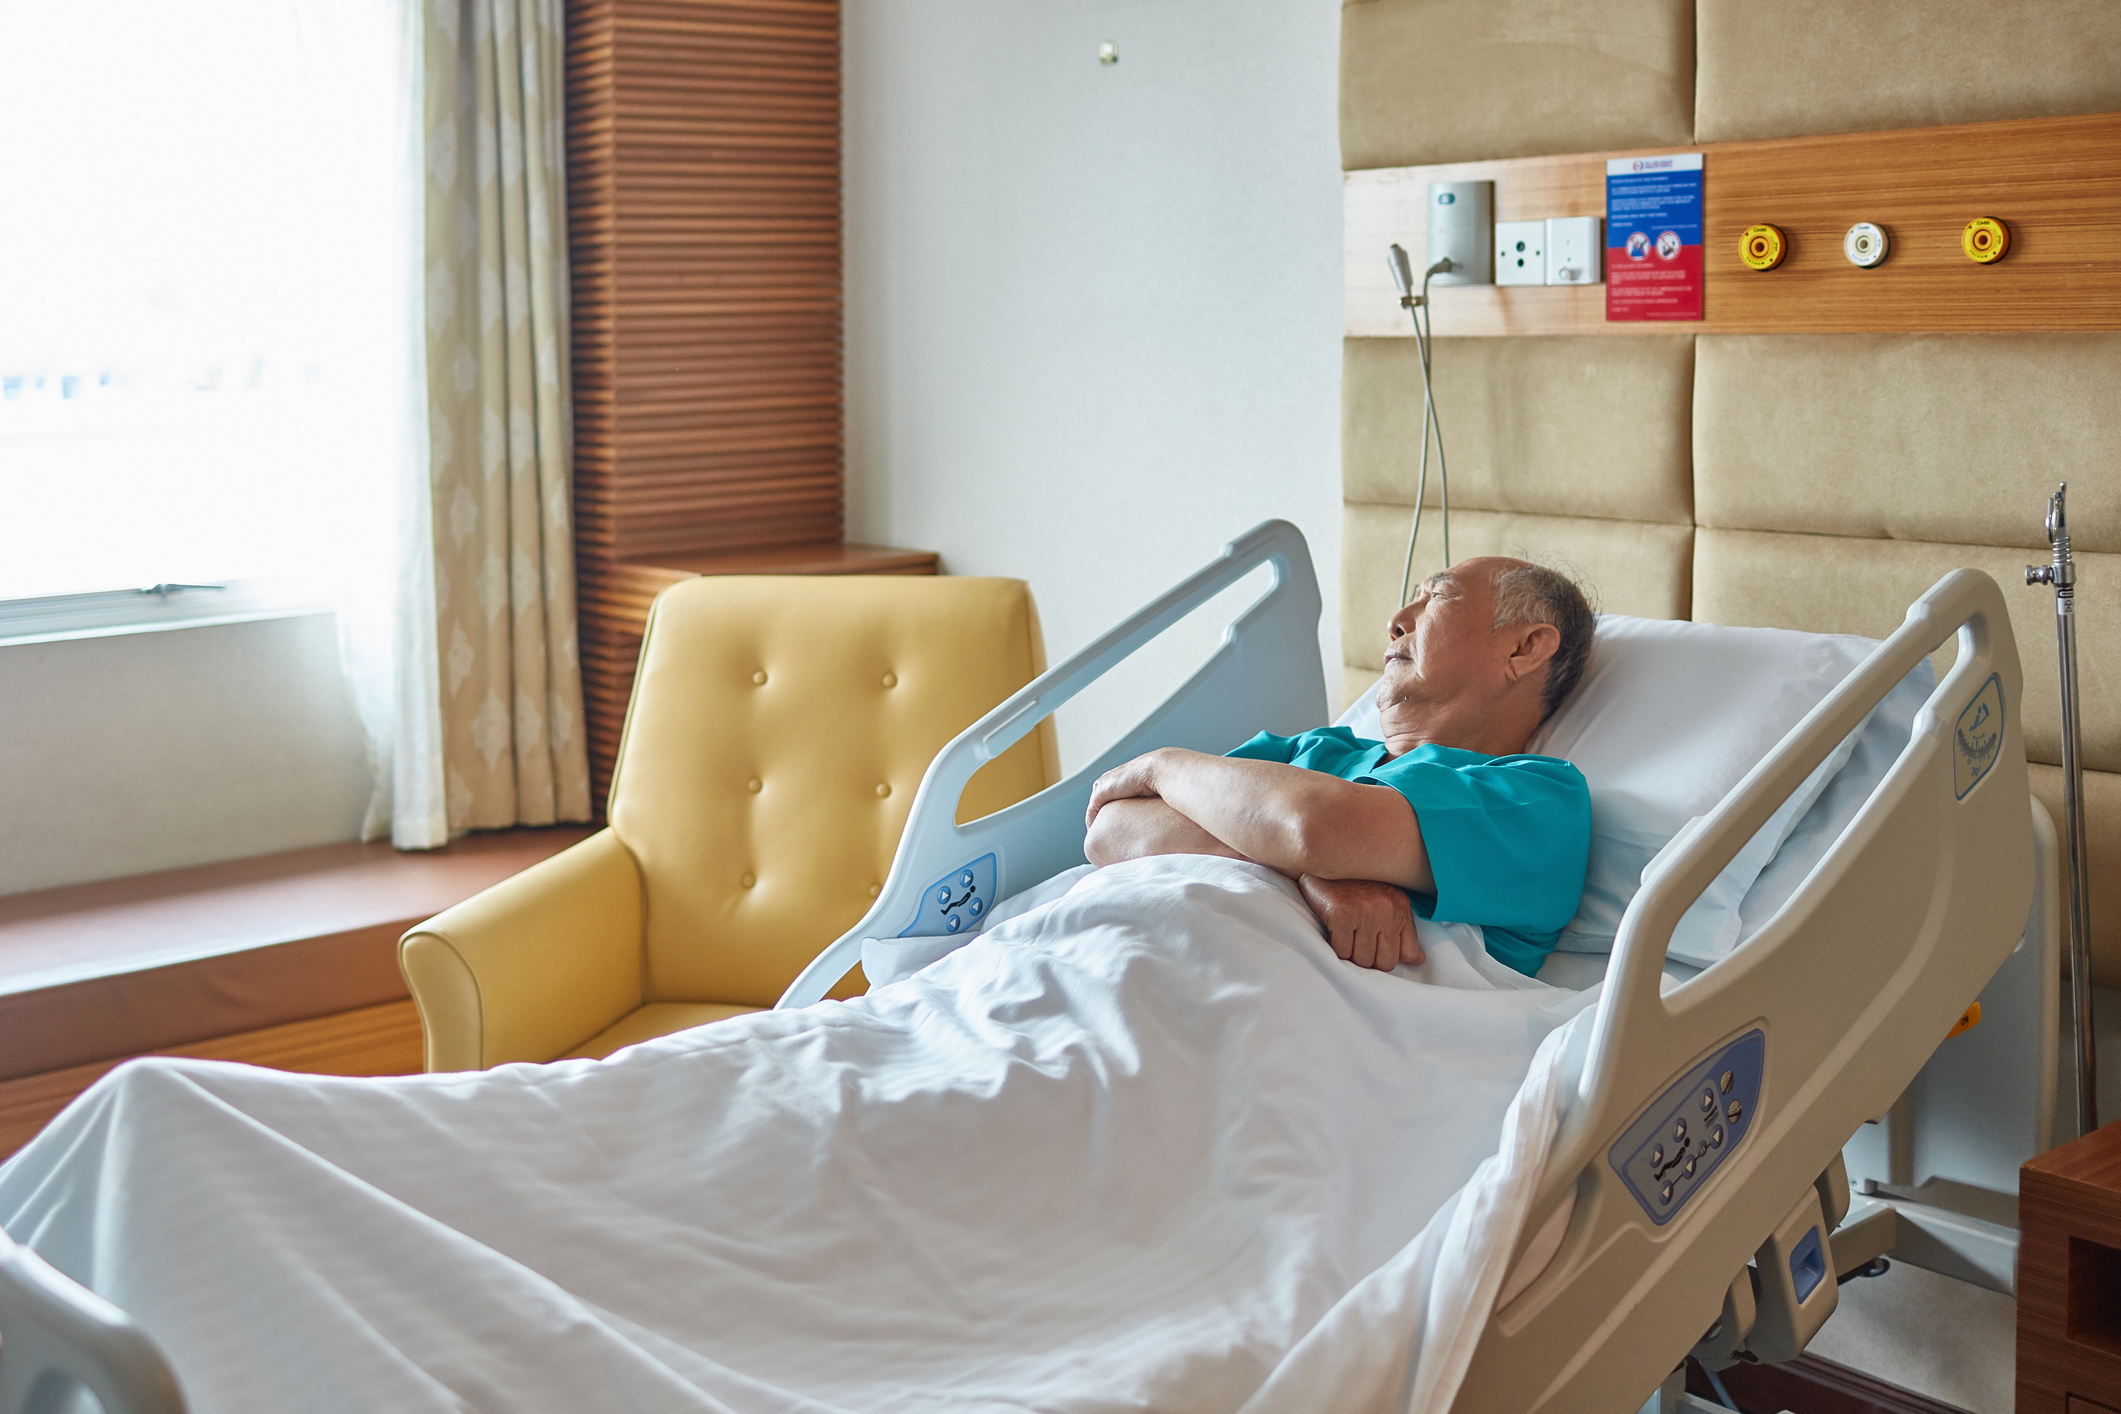 Understand delirium onset in seniors during hospitalization.